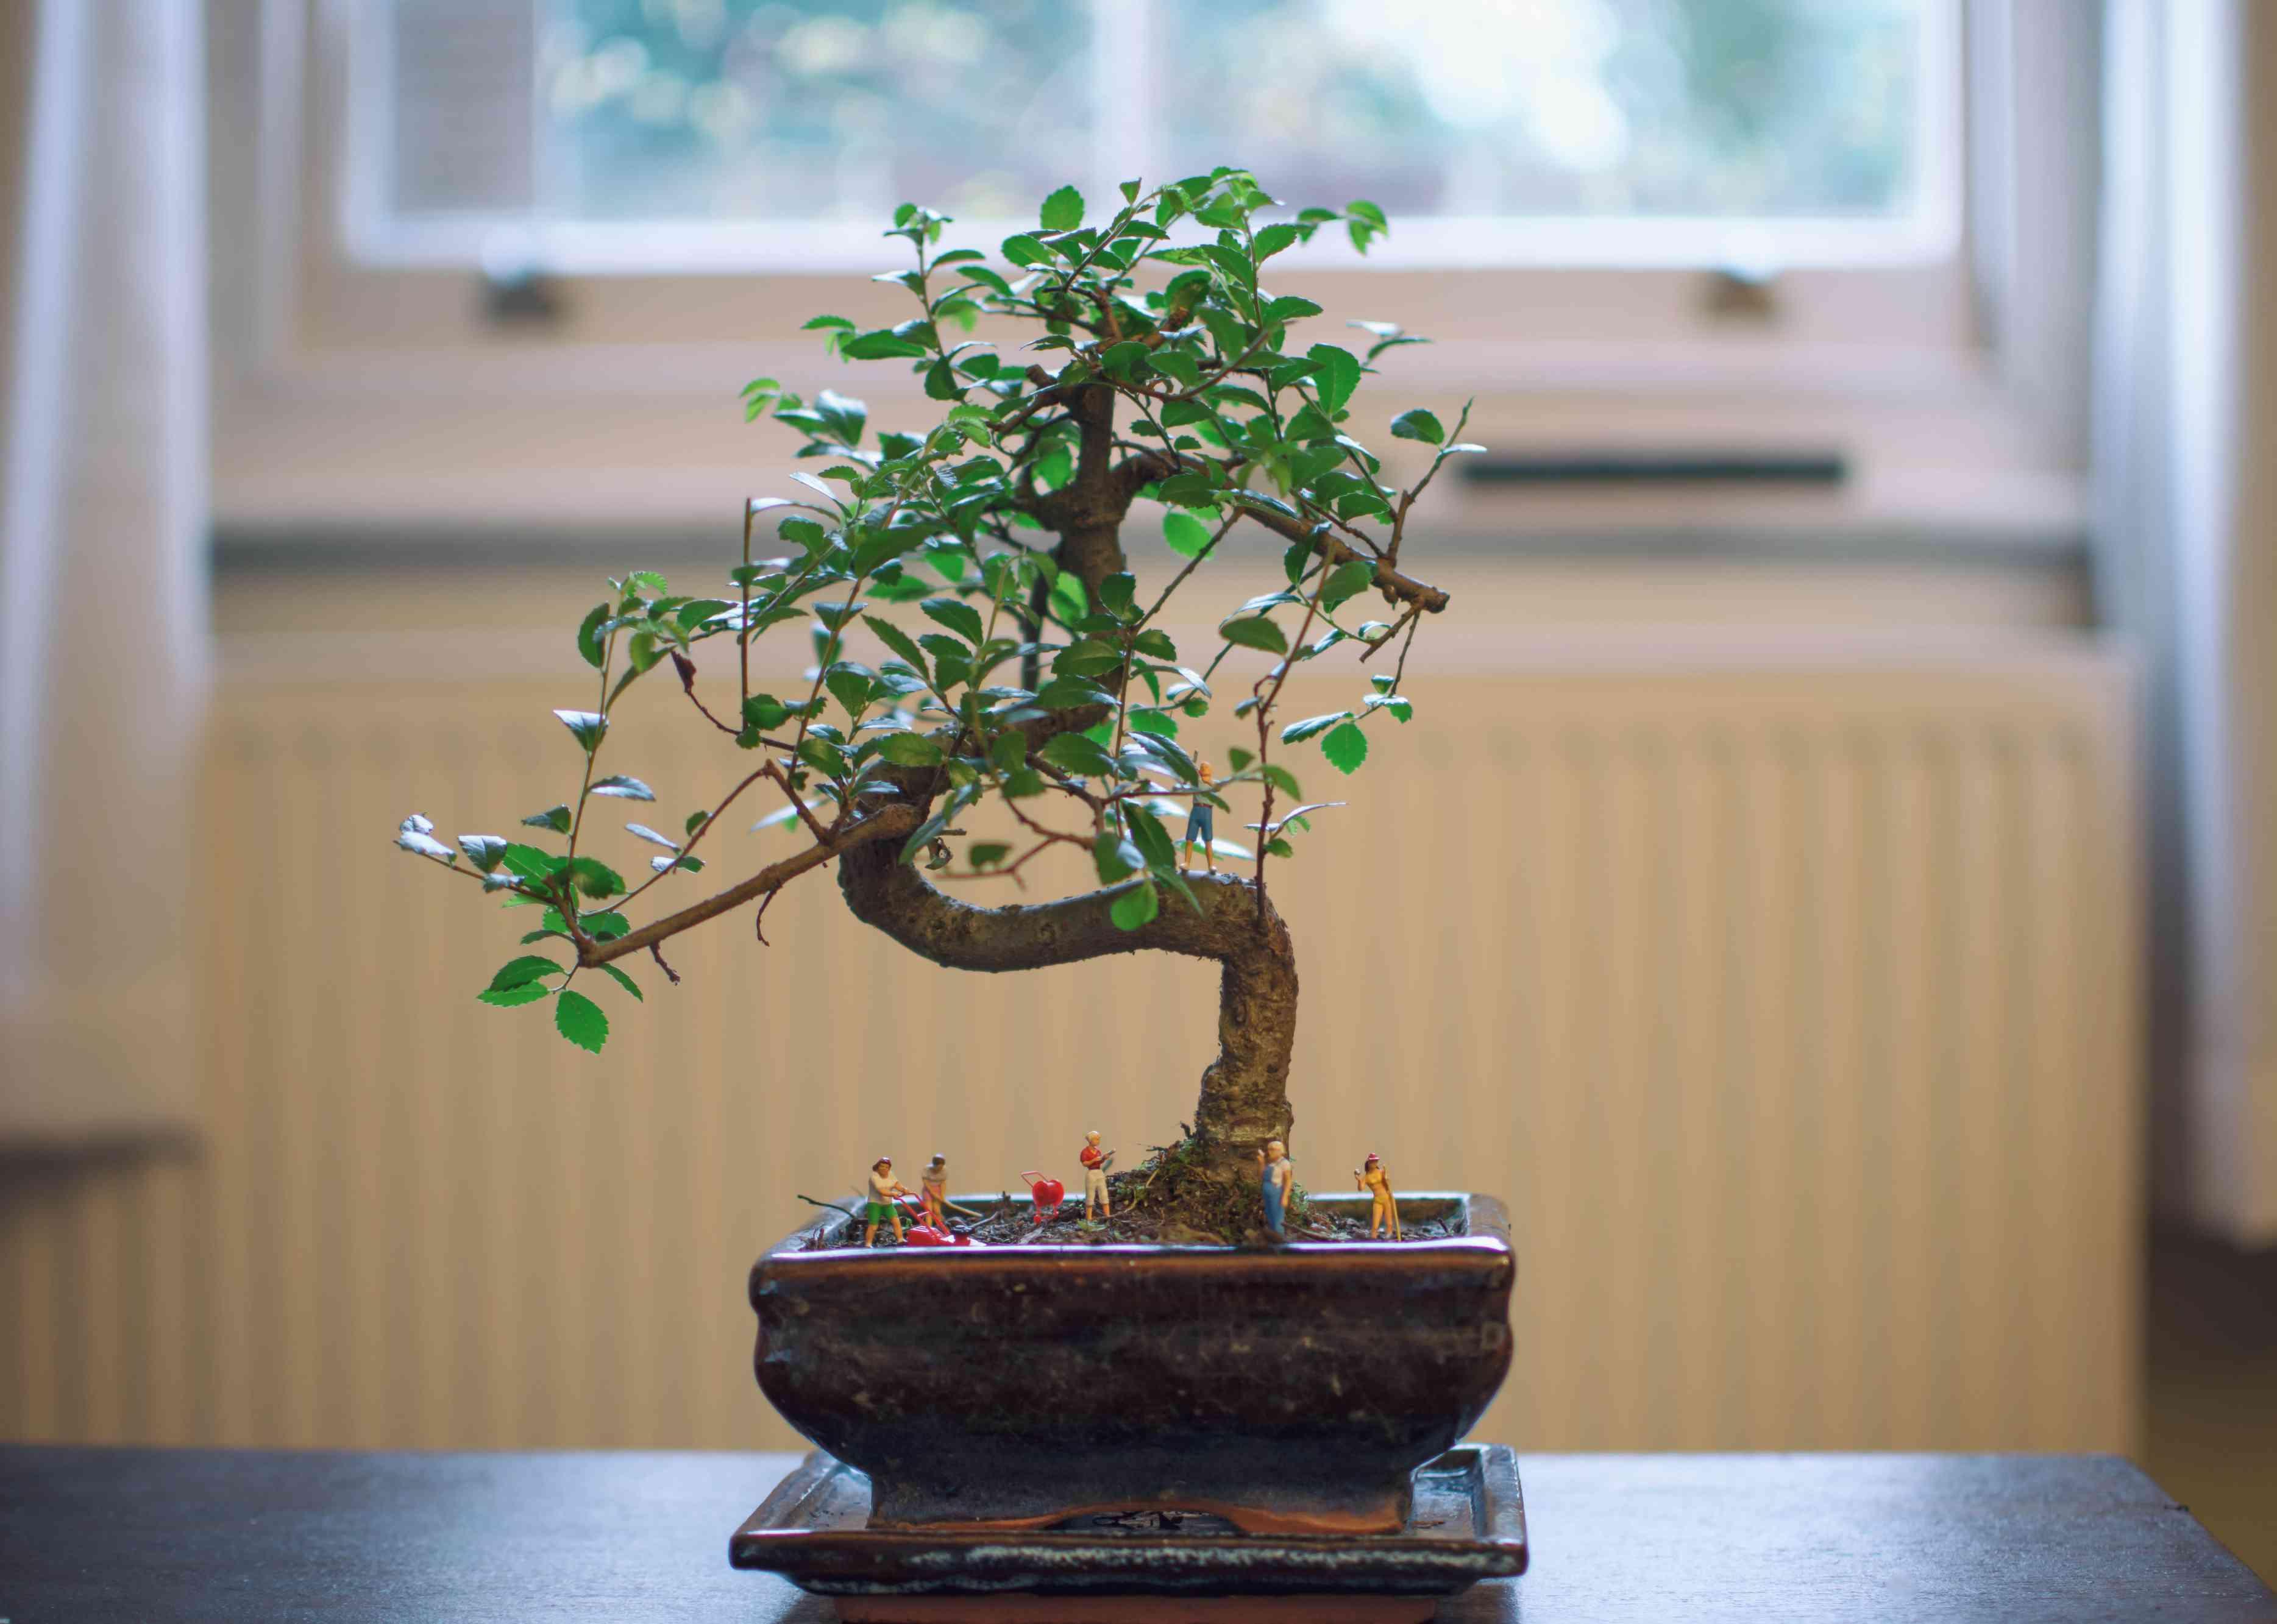 Bonsai tree in a shallow planter.